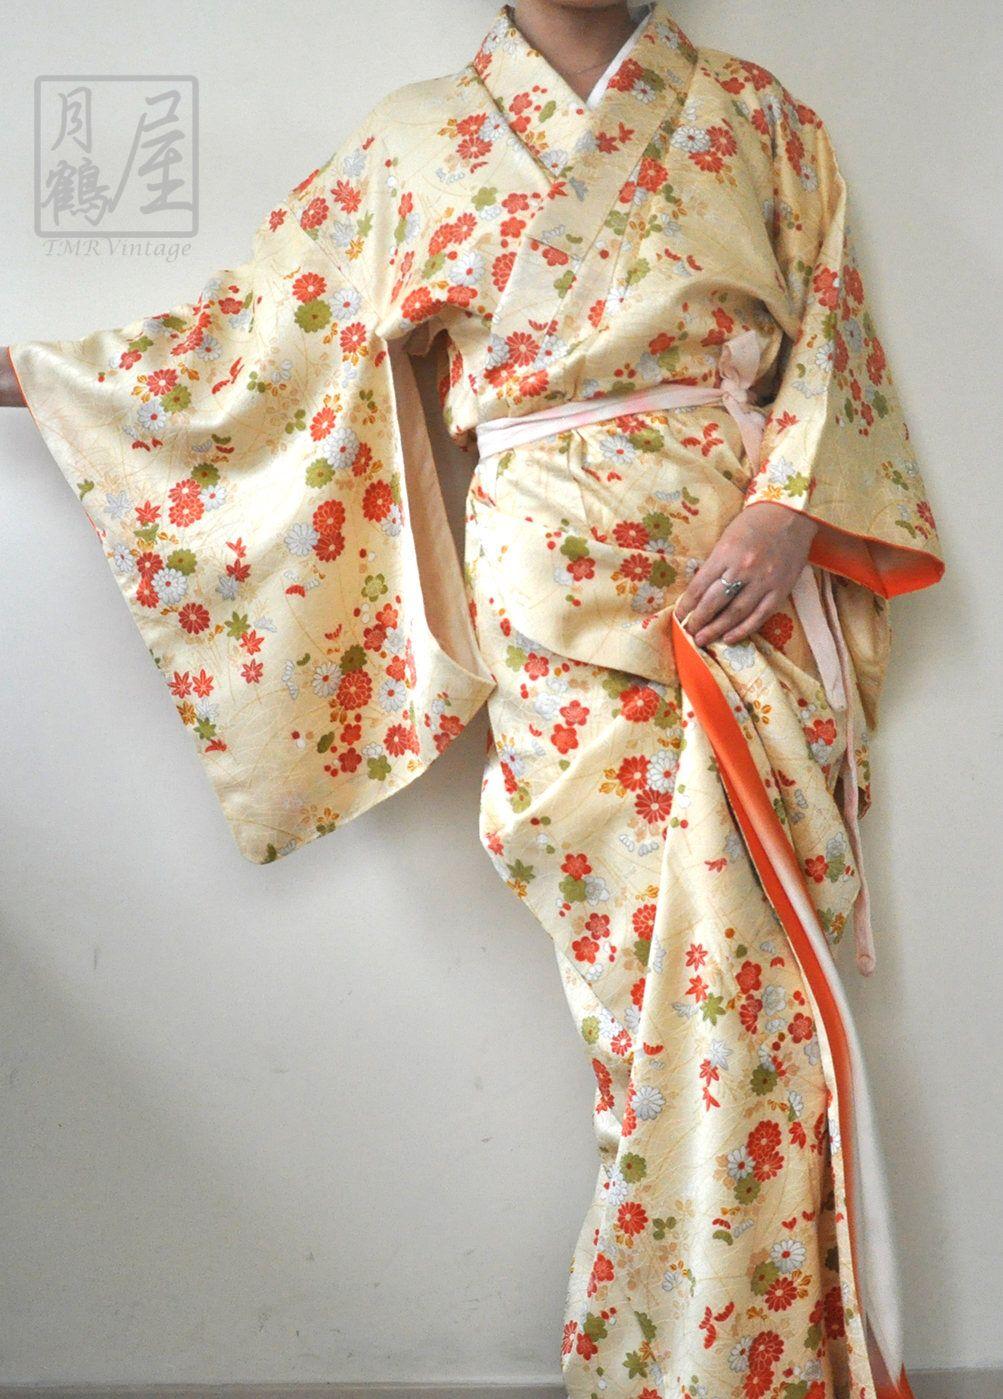 ef1b85169 Long silk kimono robe/vintage japanese full length kimono gown  dress/authenric yellow floral